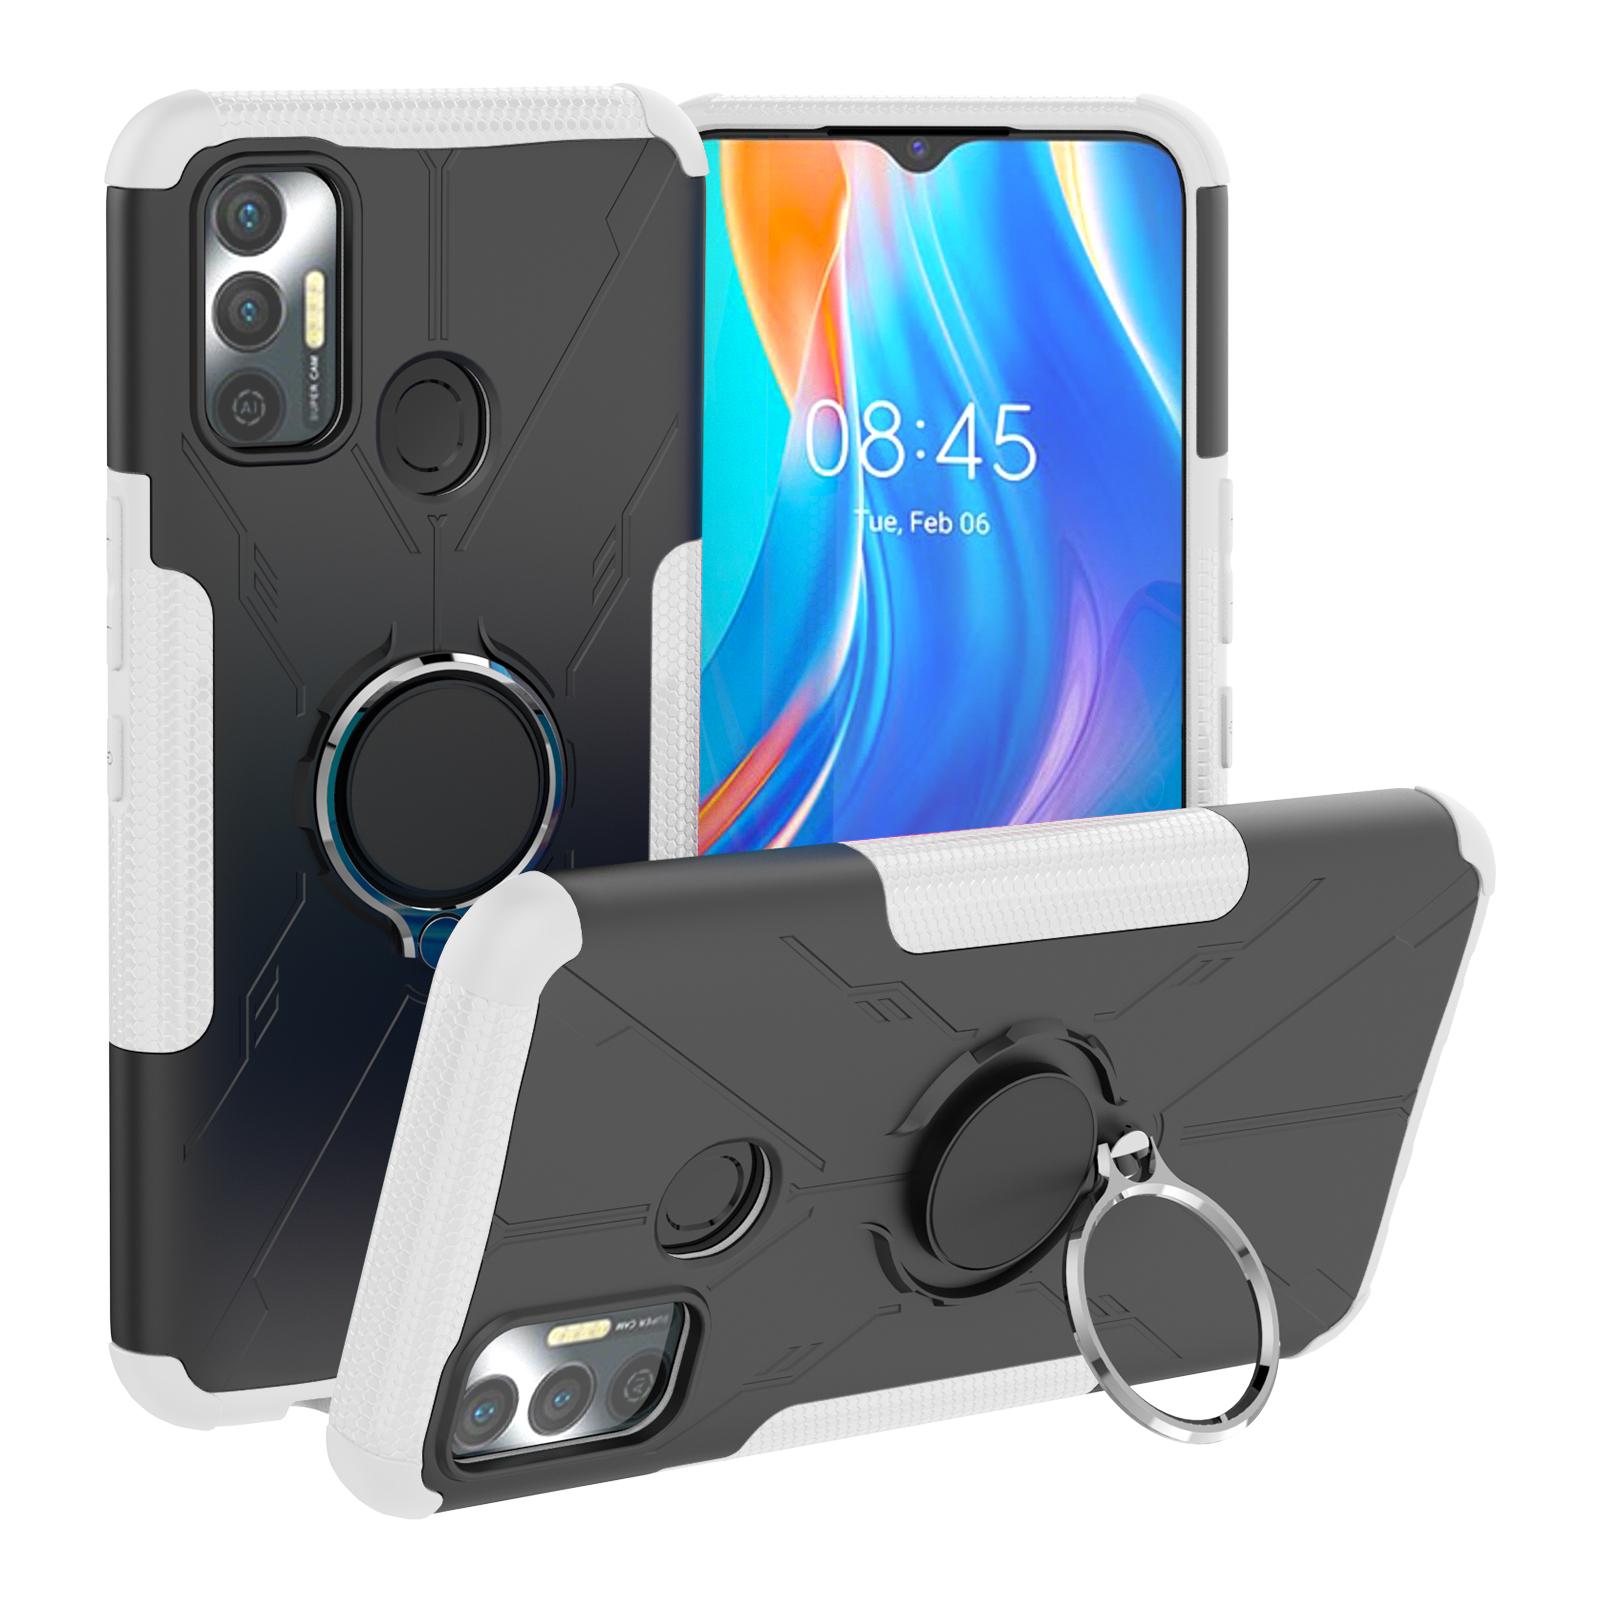 Mecha Phone Case For Tecno Spark 7